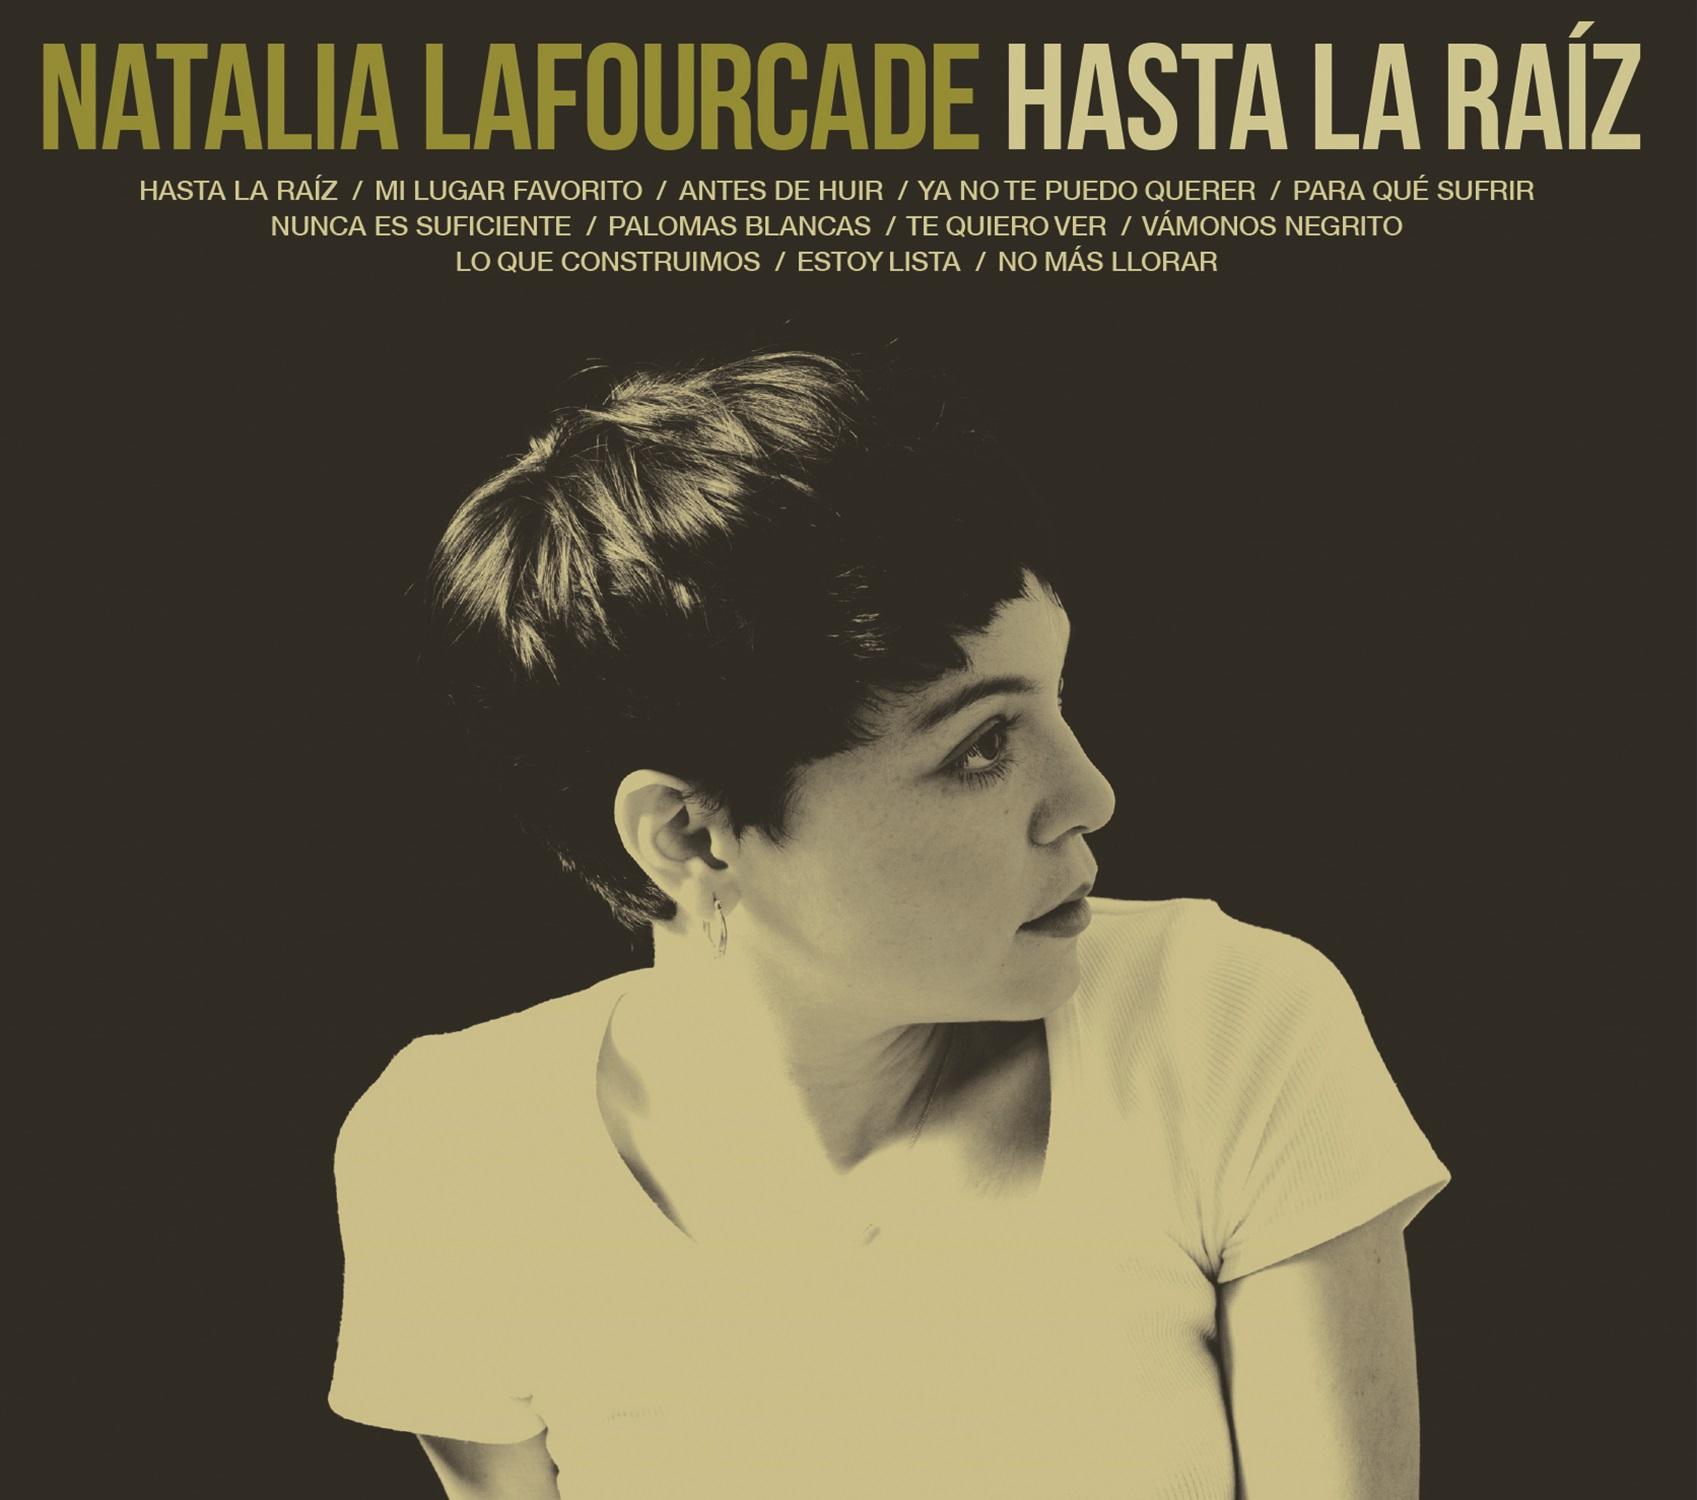 NATALIA LAFOURCADE_cover HASTA LA RAIZ